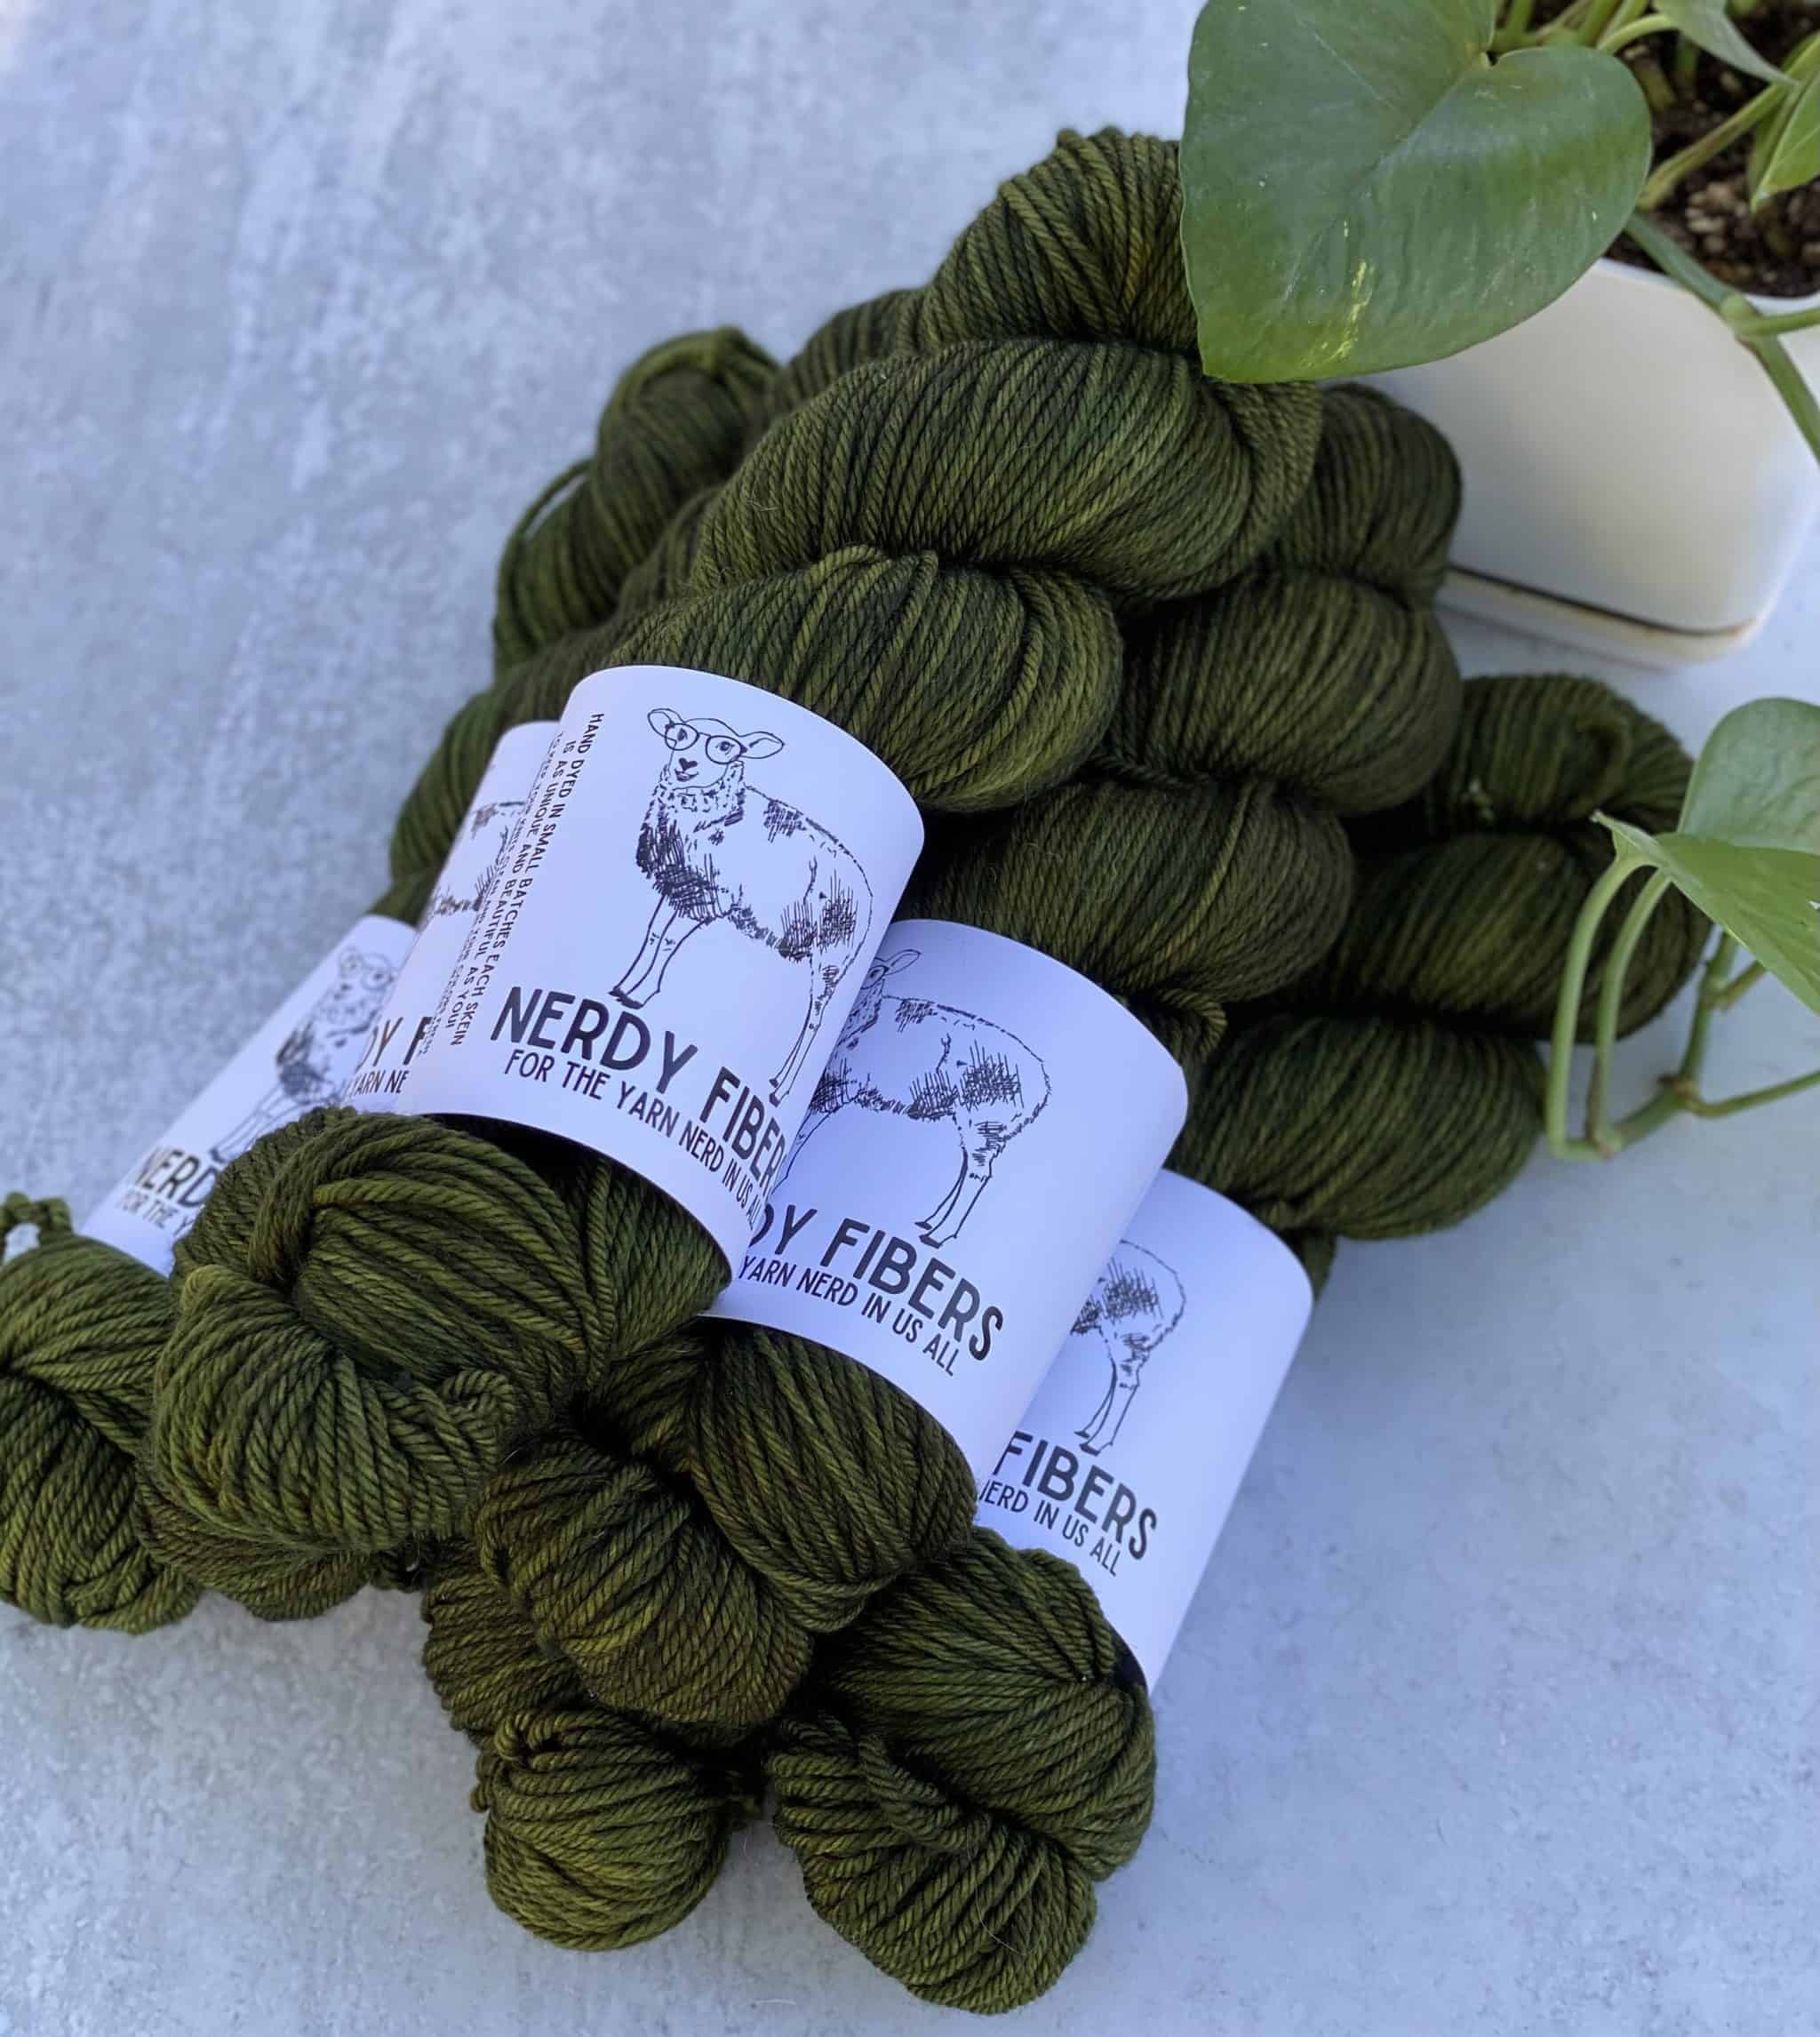 Skeins of mossy green yarn.